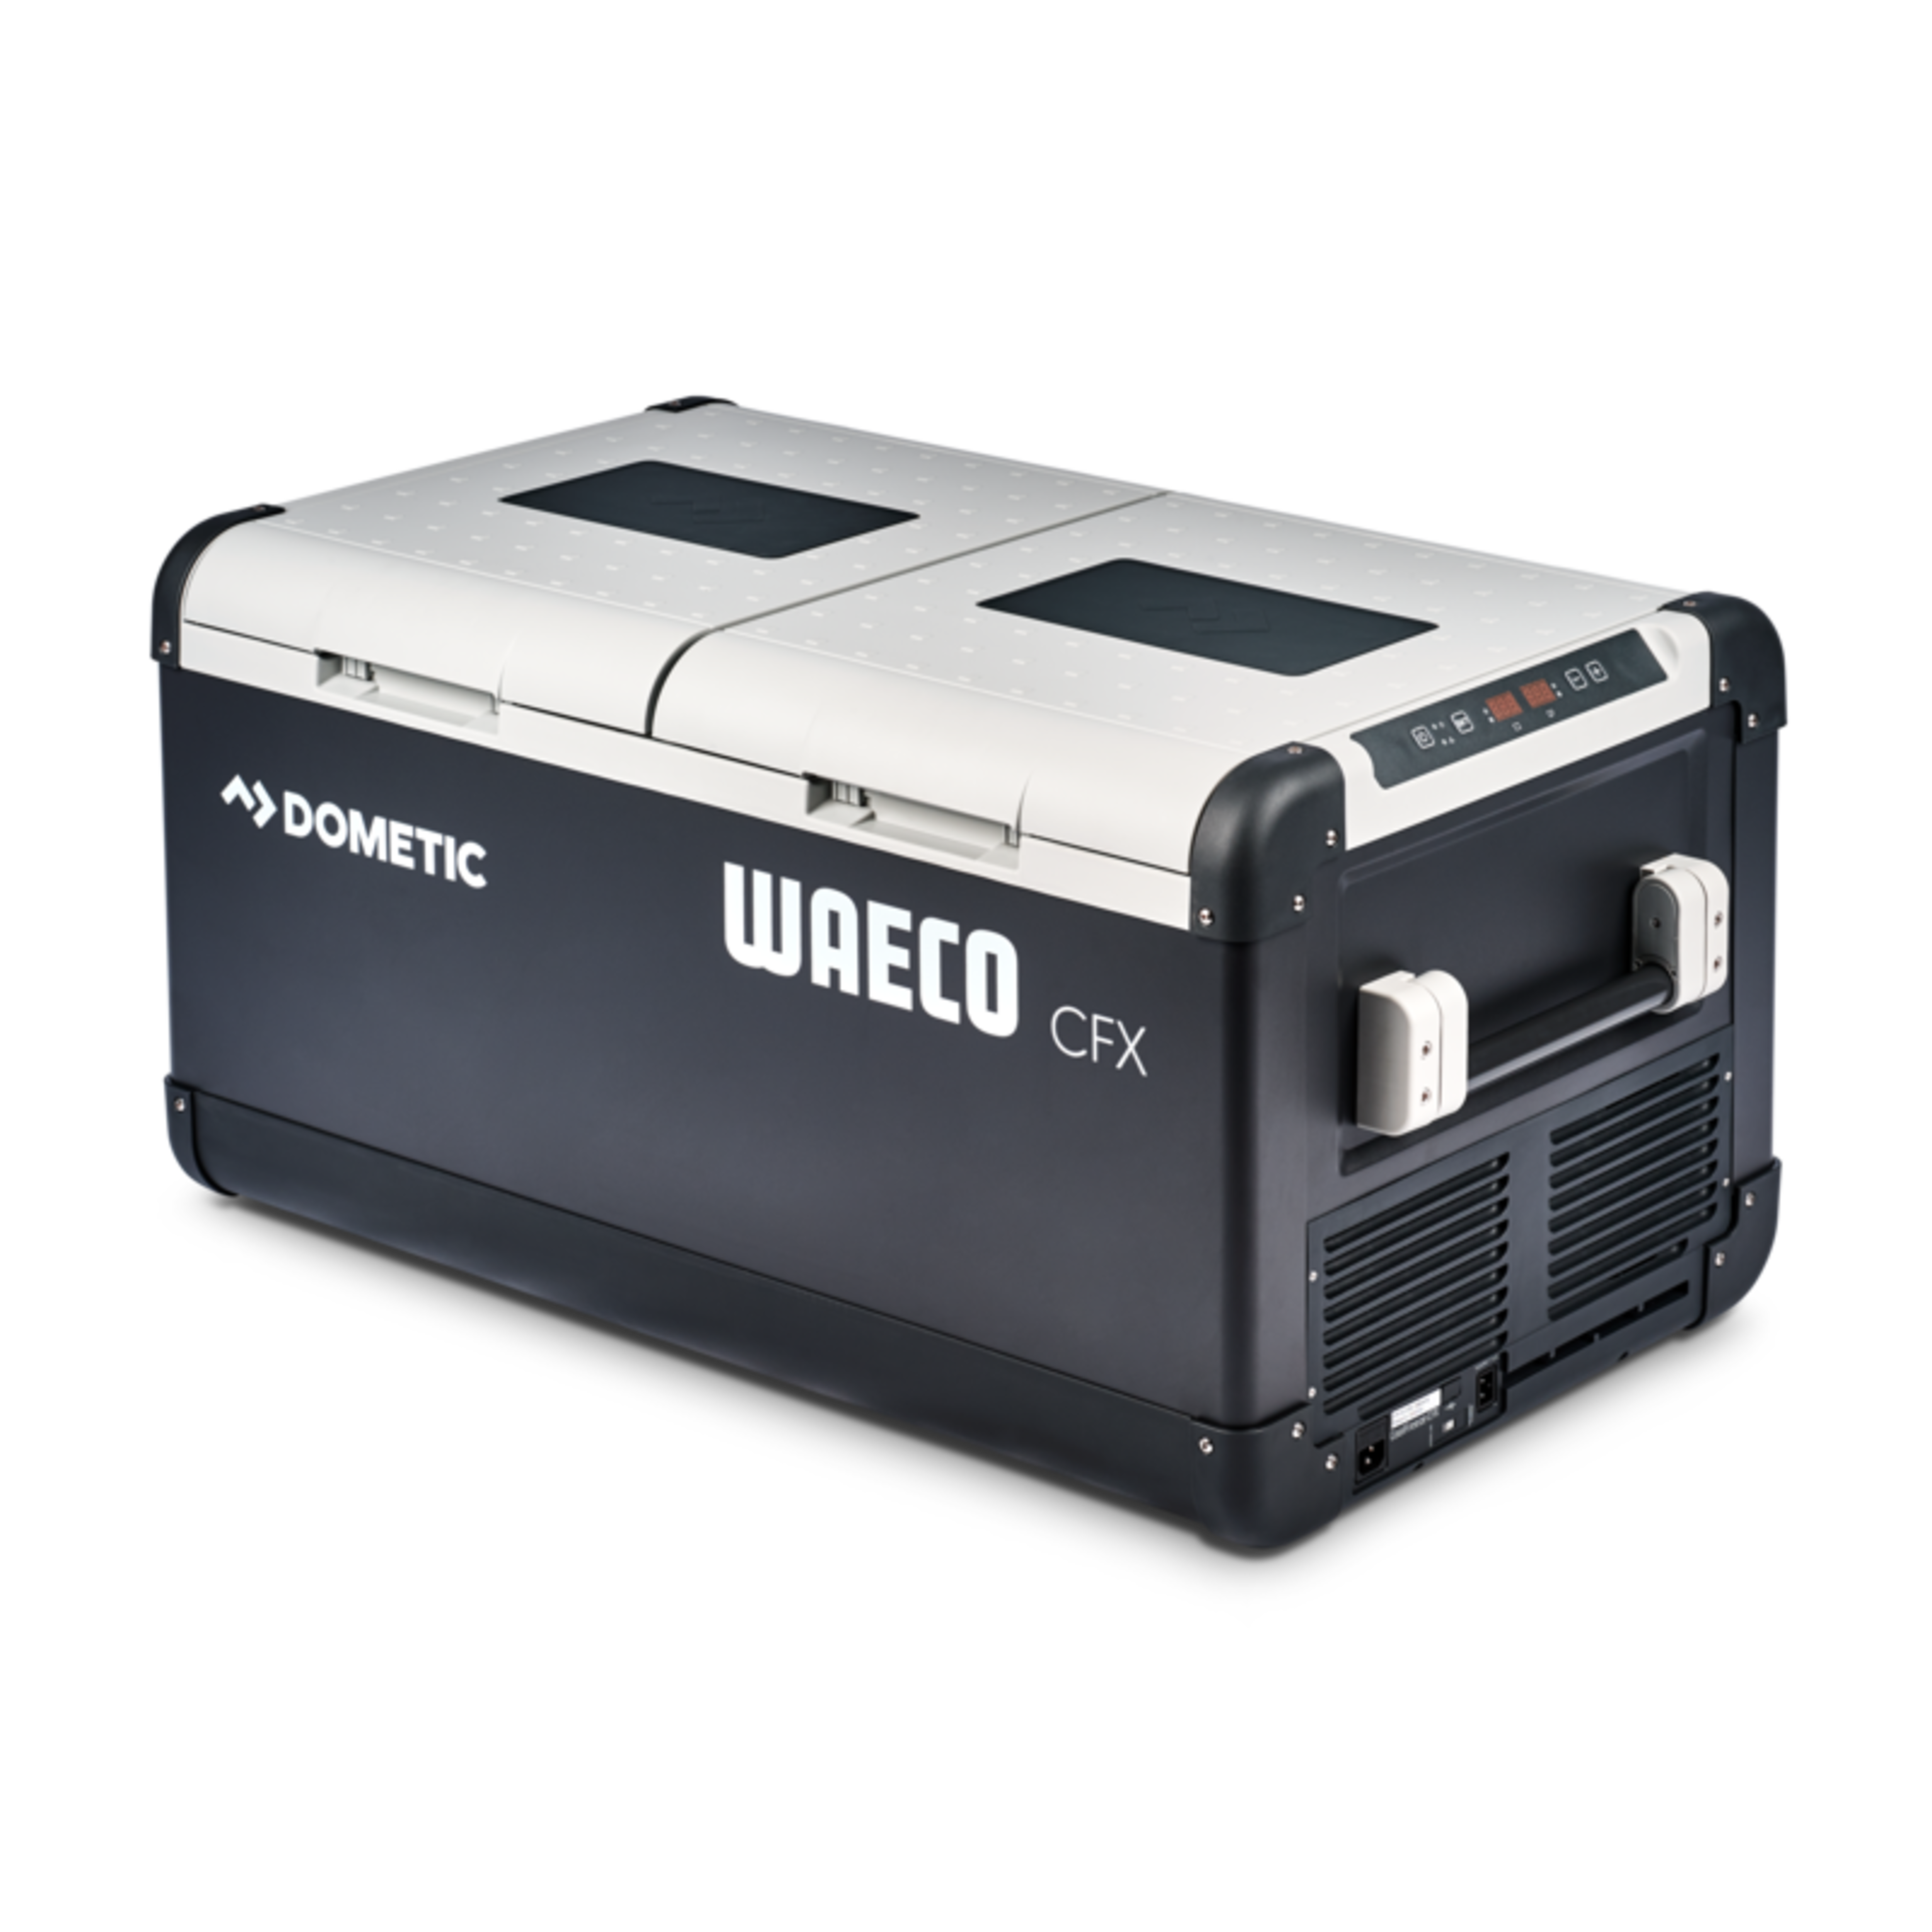 Dometic Waeco CFX 95DZW